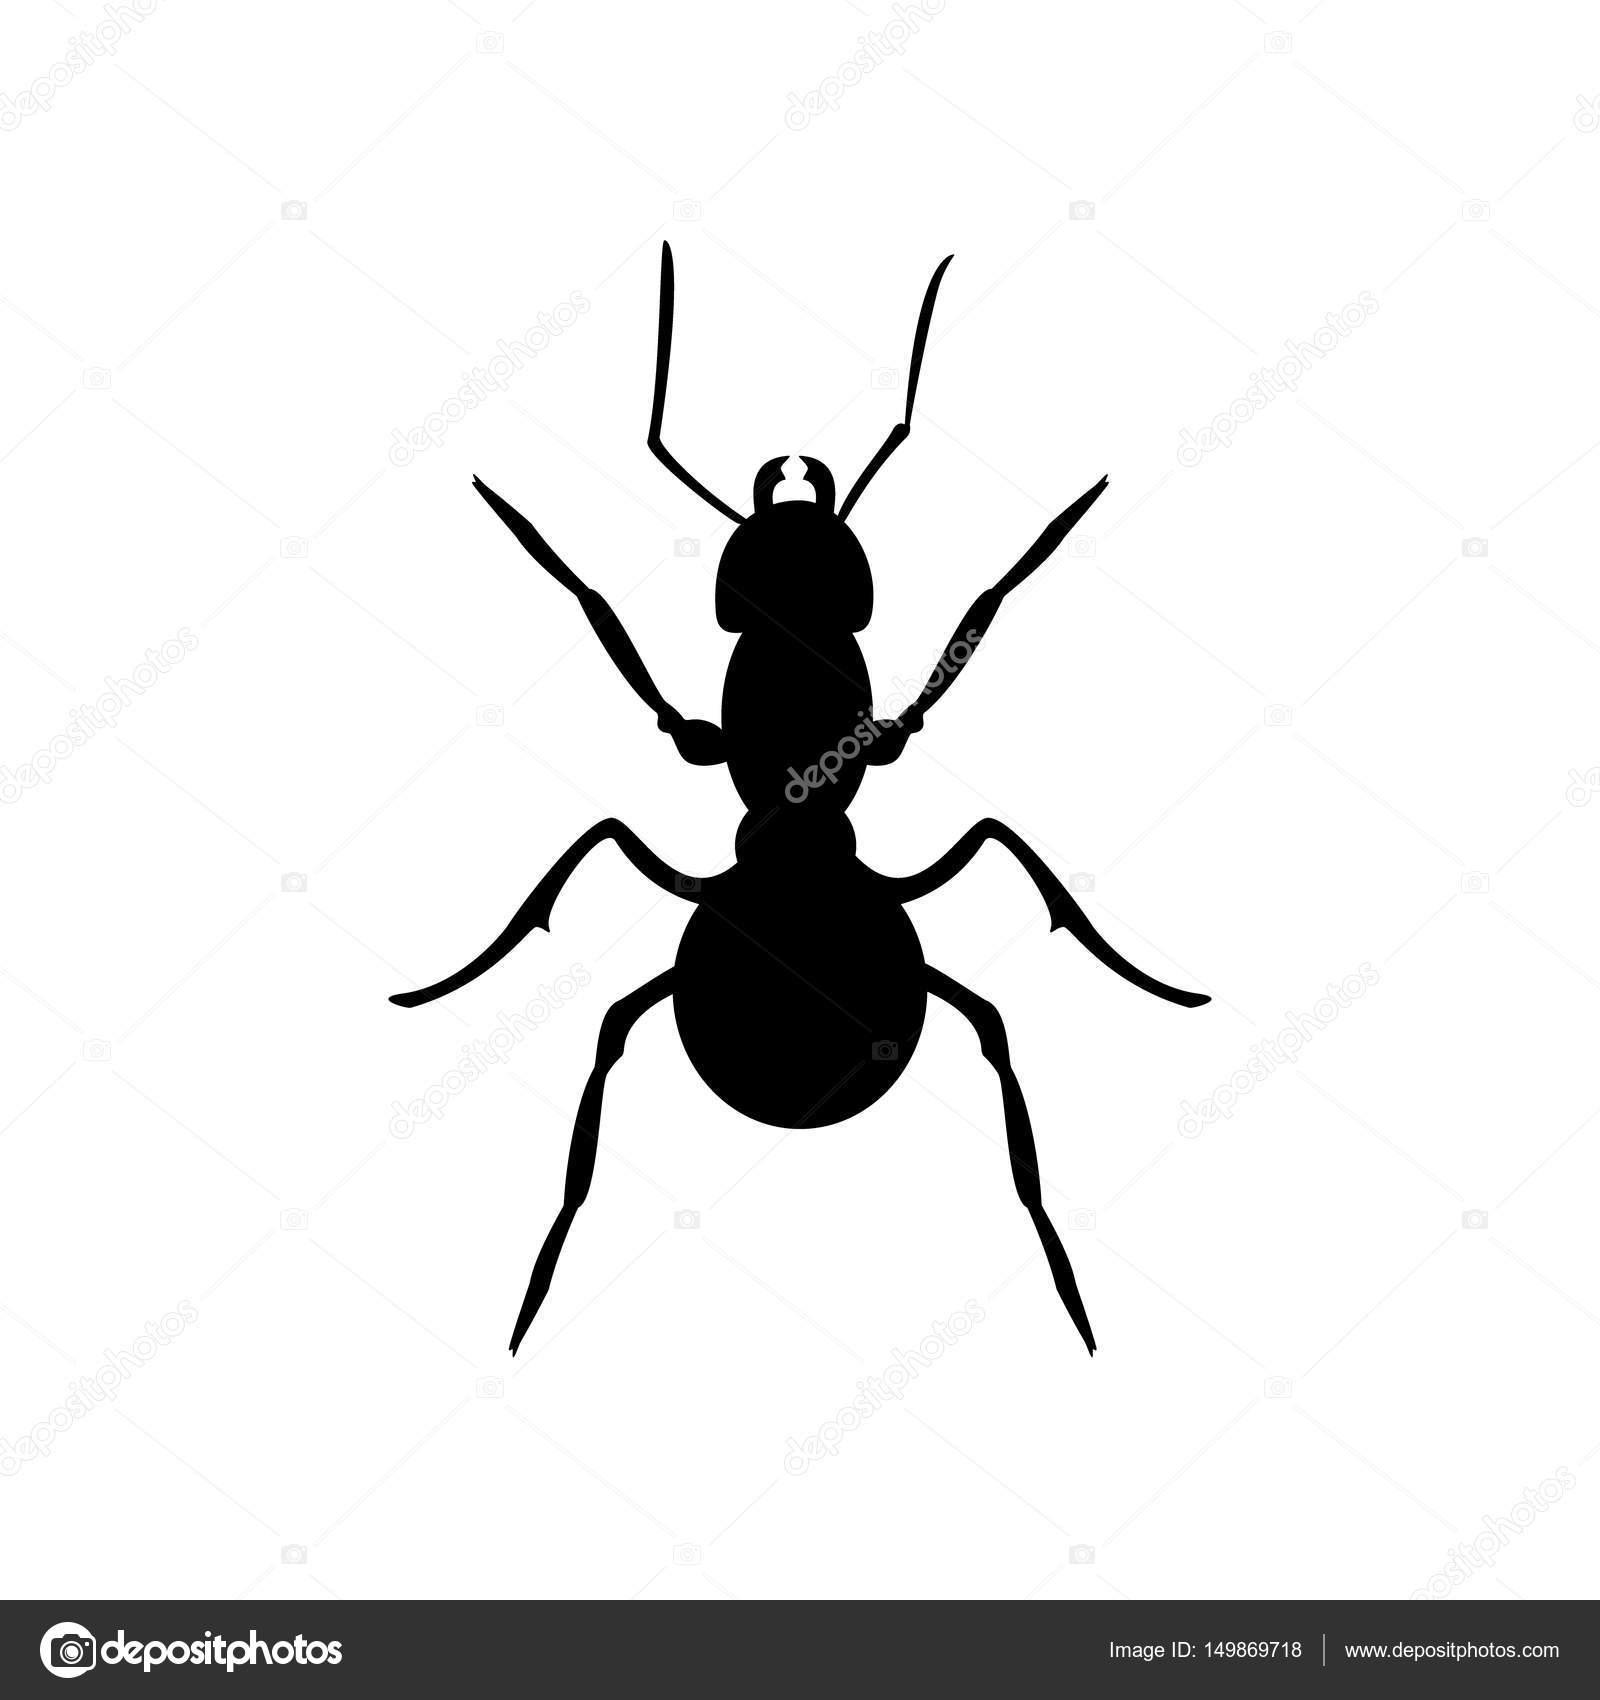 Silueta de hormiga negra — Foto de stock © viktorijareut #149869718